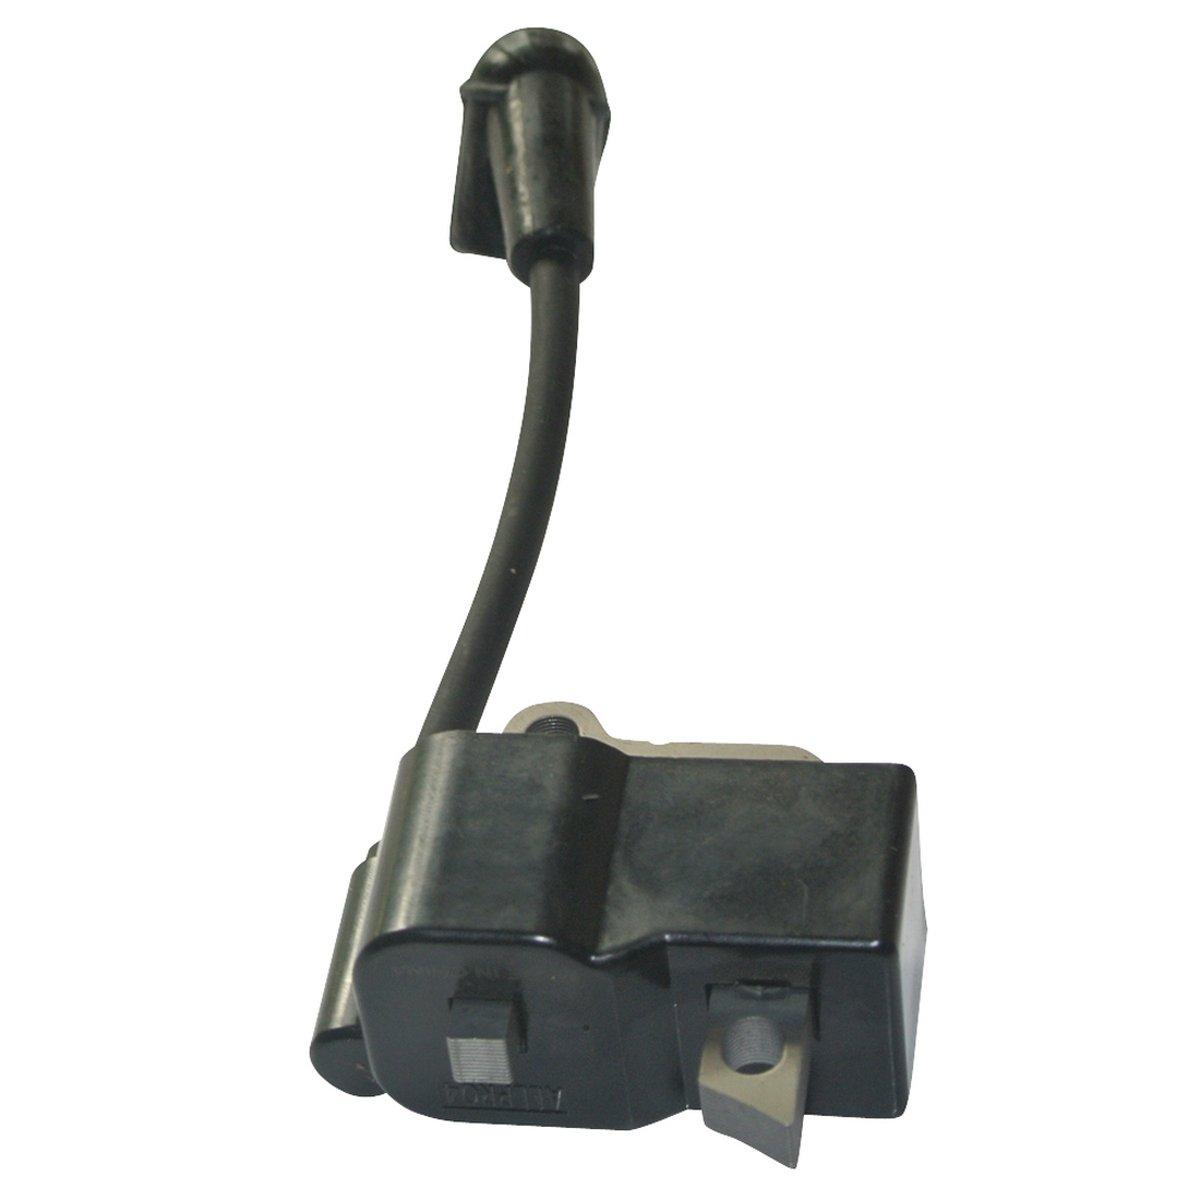 Ignition Coil Module Fit Jonsered CS2245 CS2250 Husqvarna 435 445 450E Chainsaw New